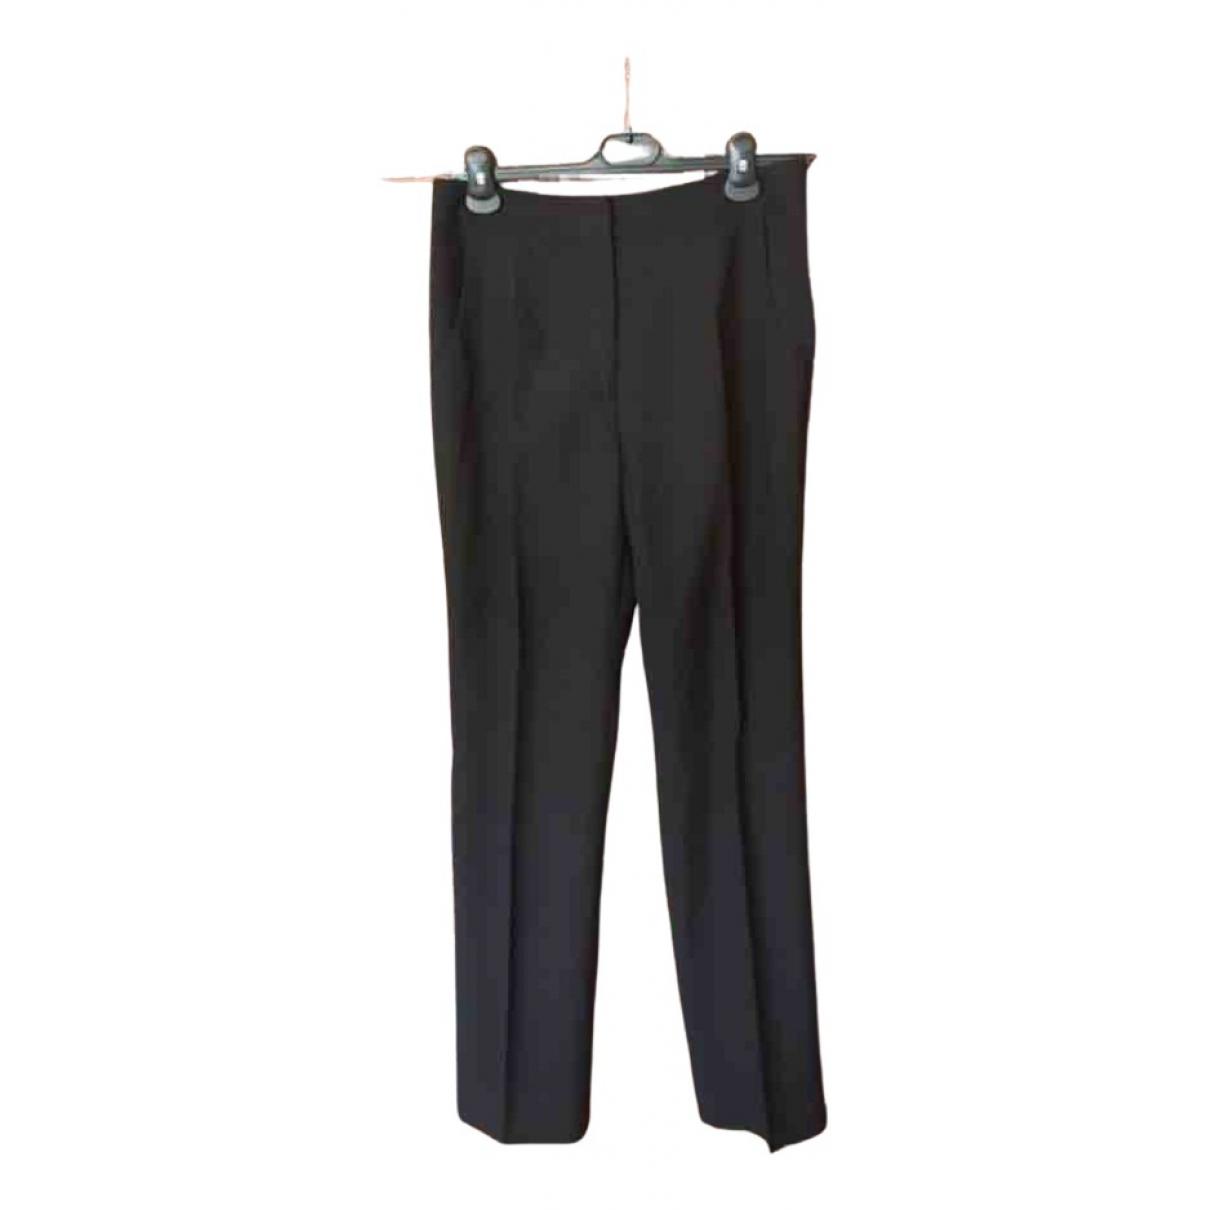 Pantalon recto de Lana Guy Laroche